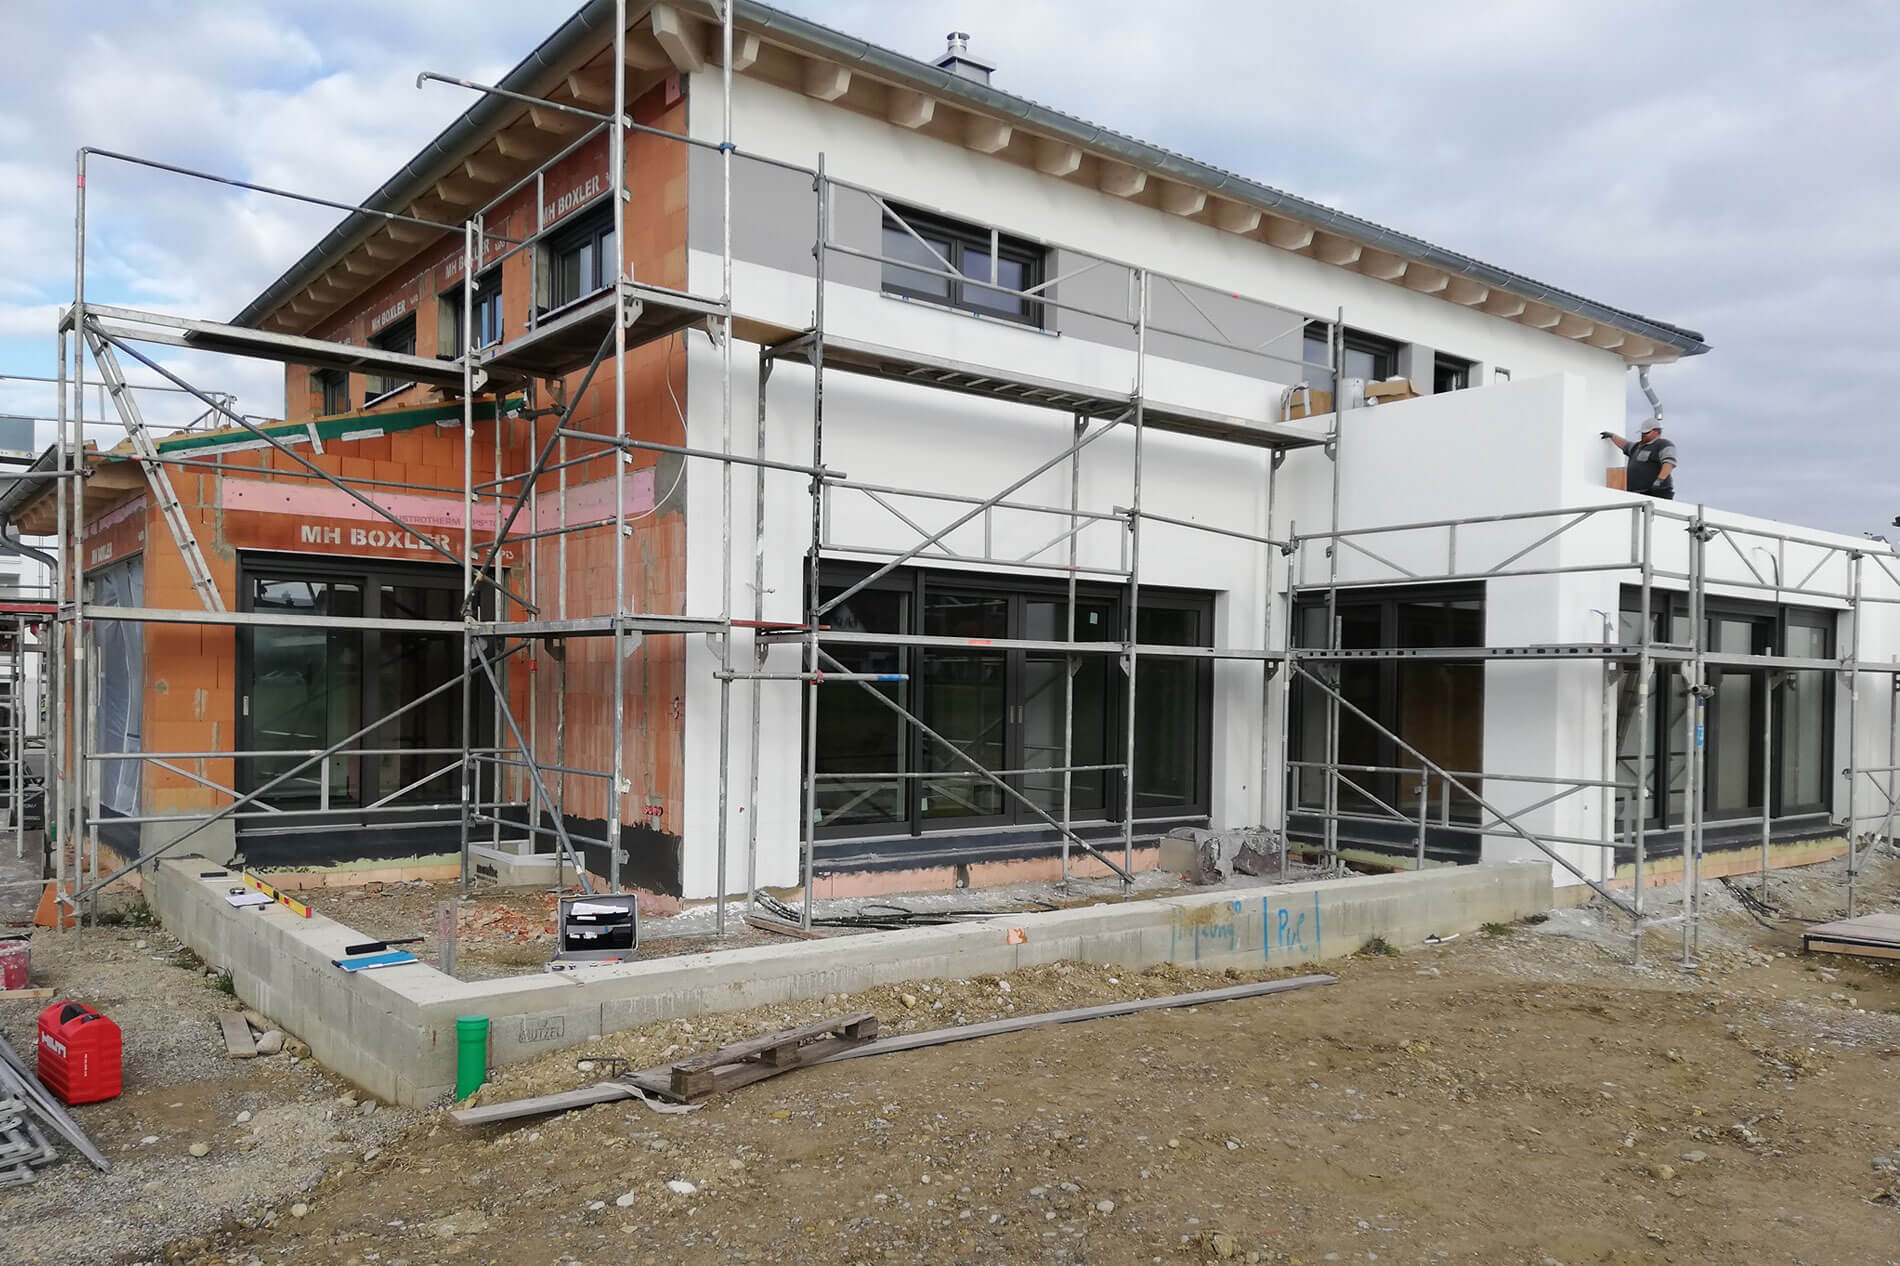 Haus ohne Terrassenüberdachung